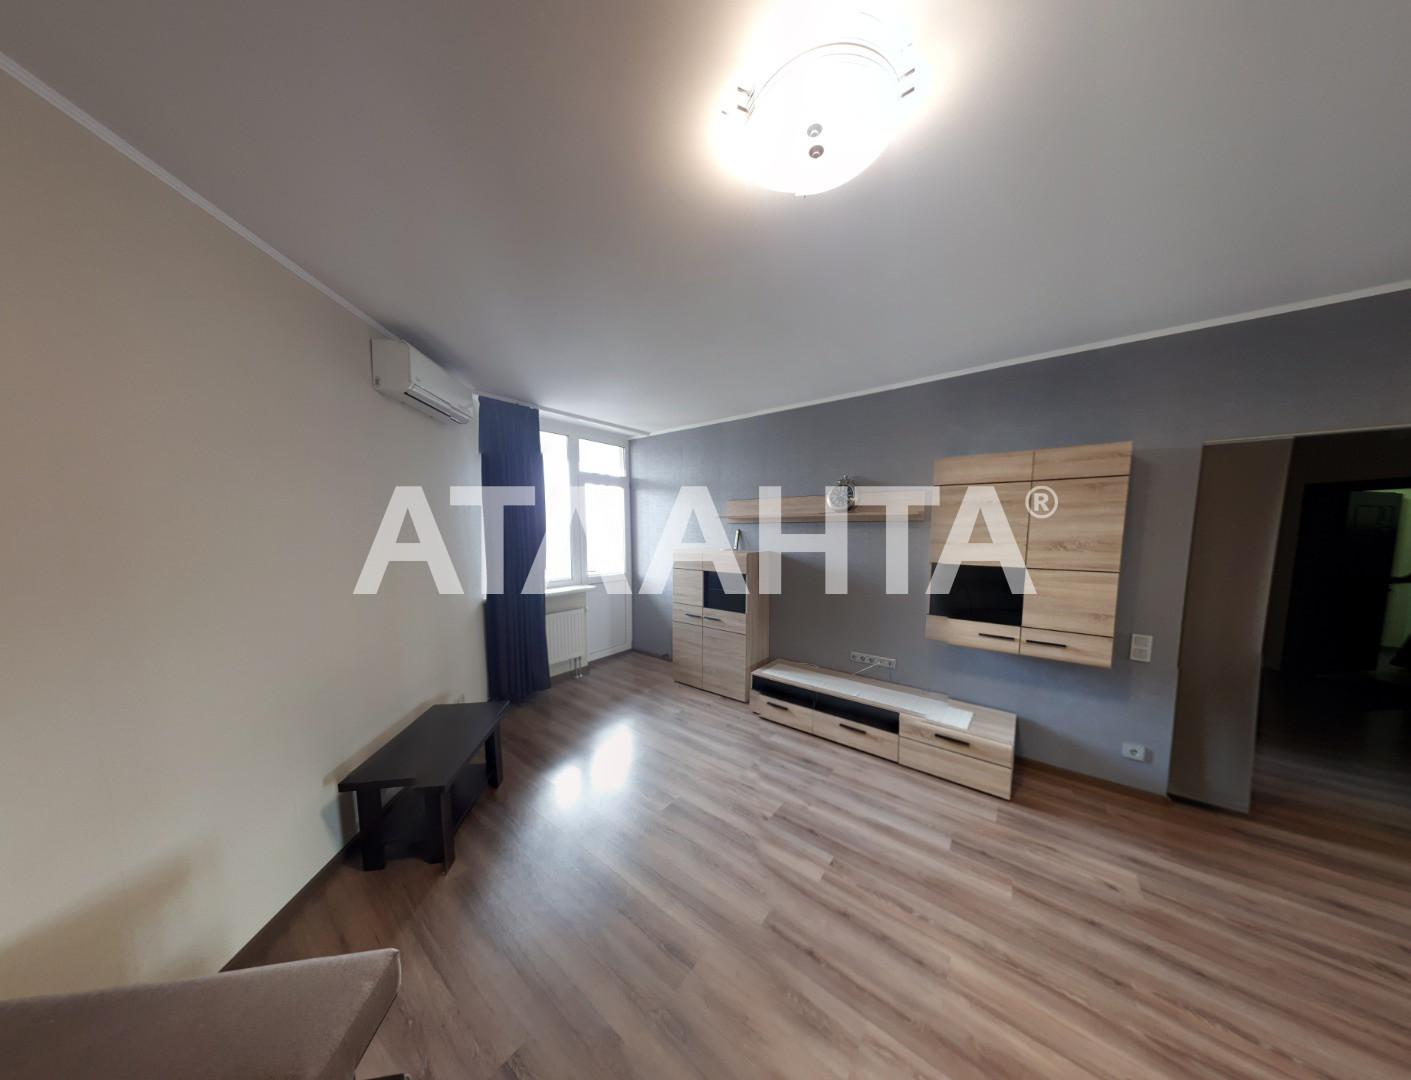 Продается 1-комнатная Квартира на ул. Ул. Мейтуса — 82 000 у.е. (фото №4)